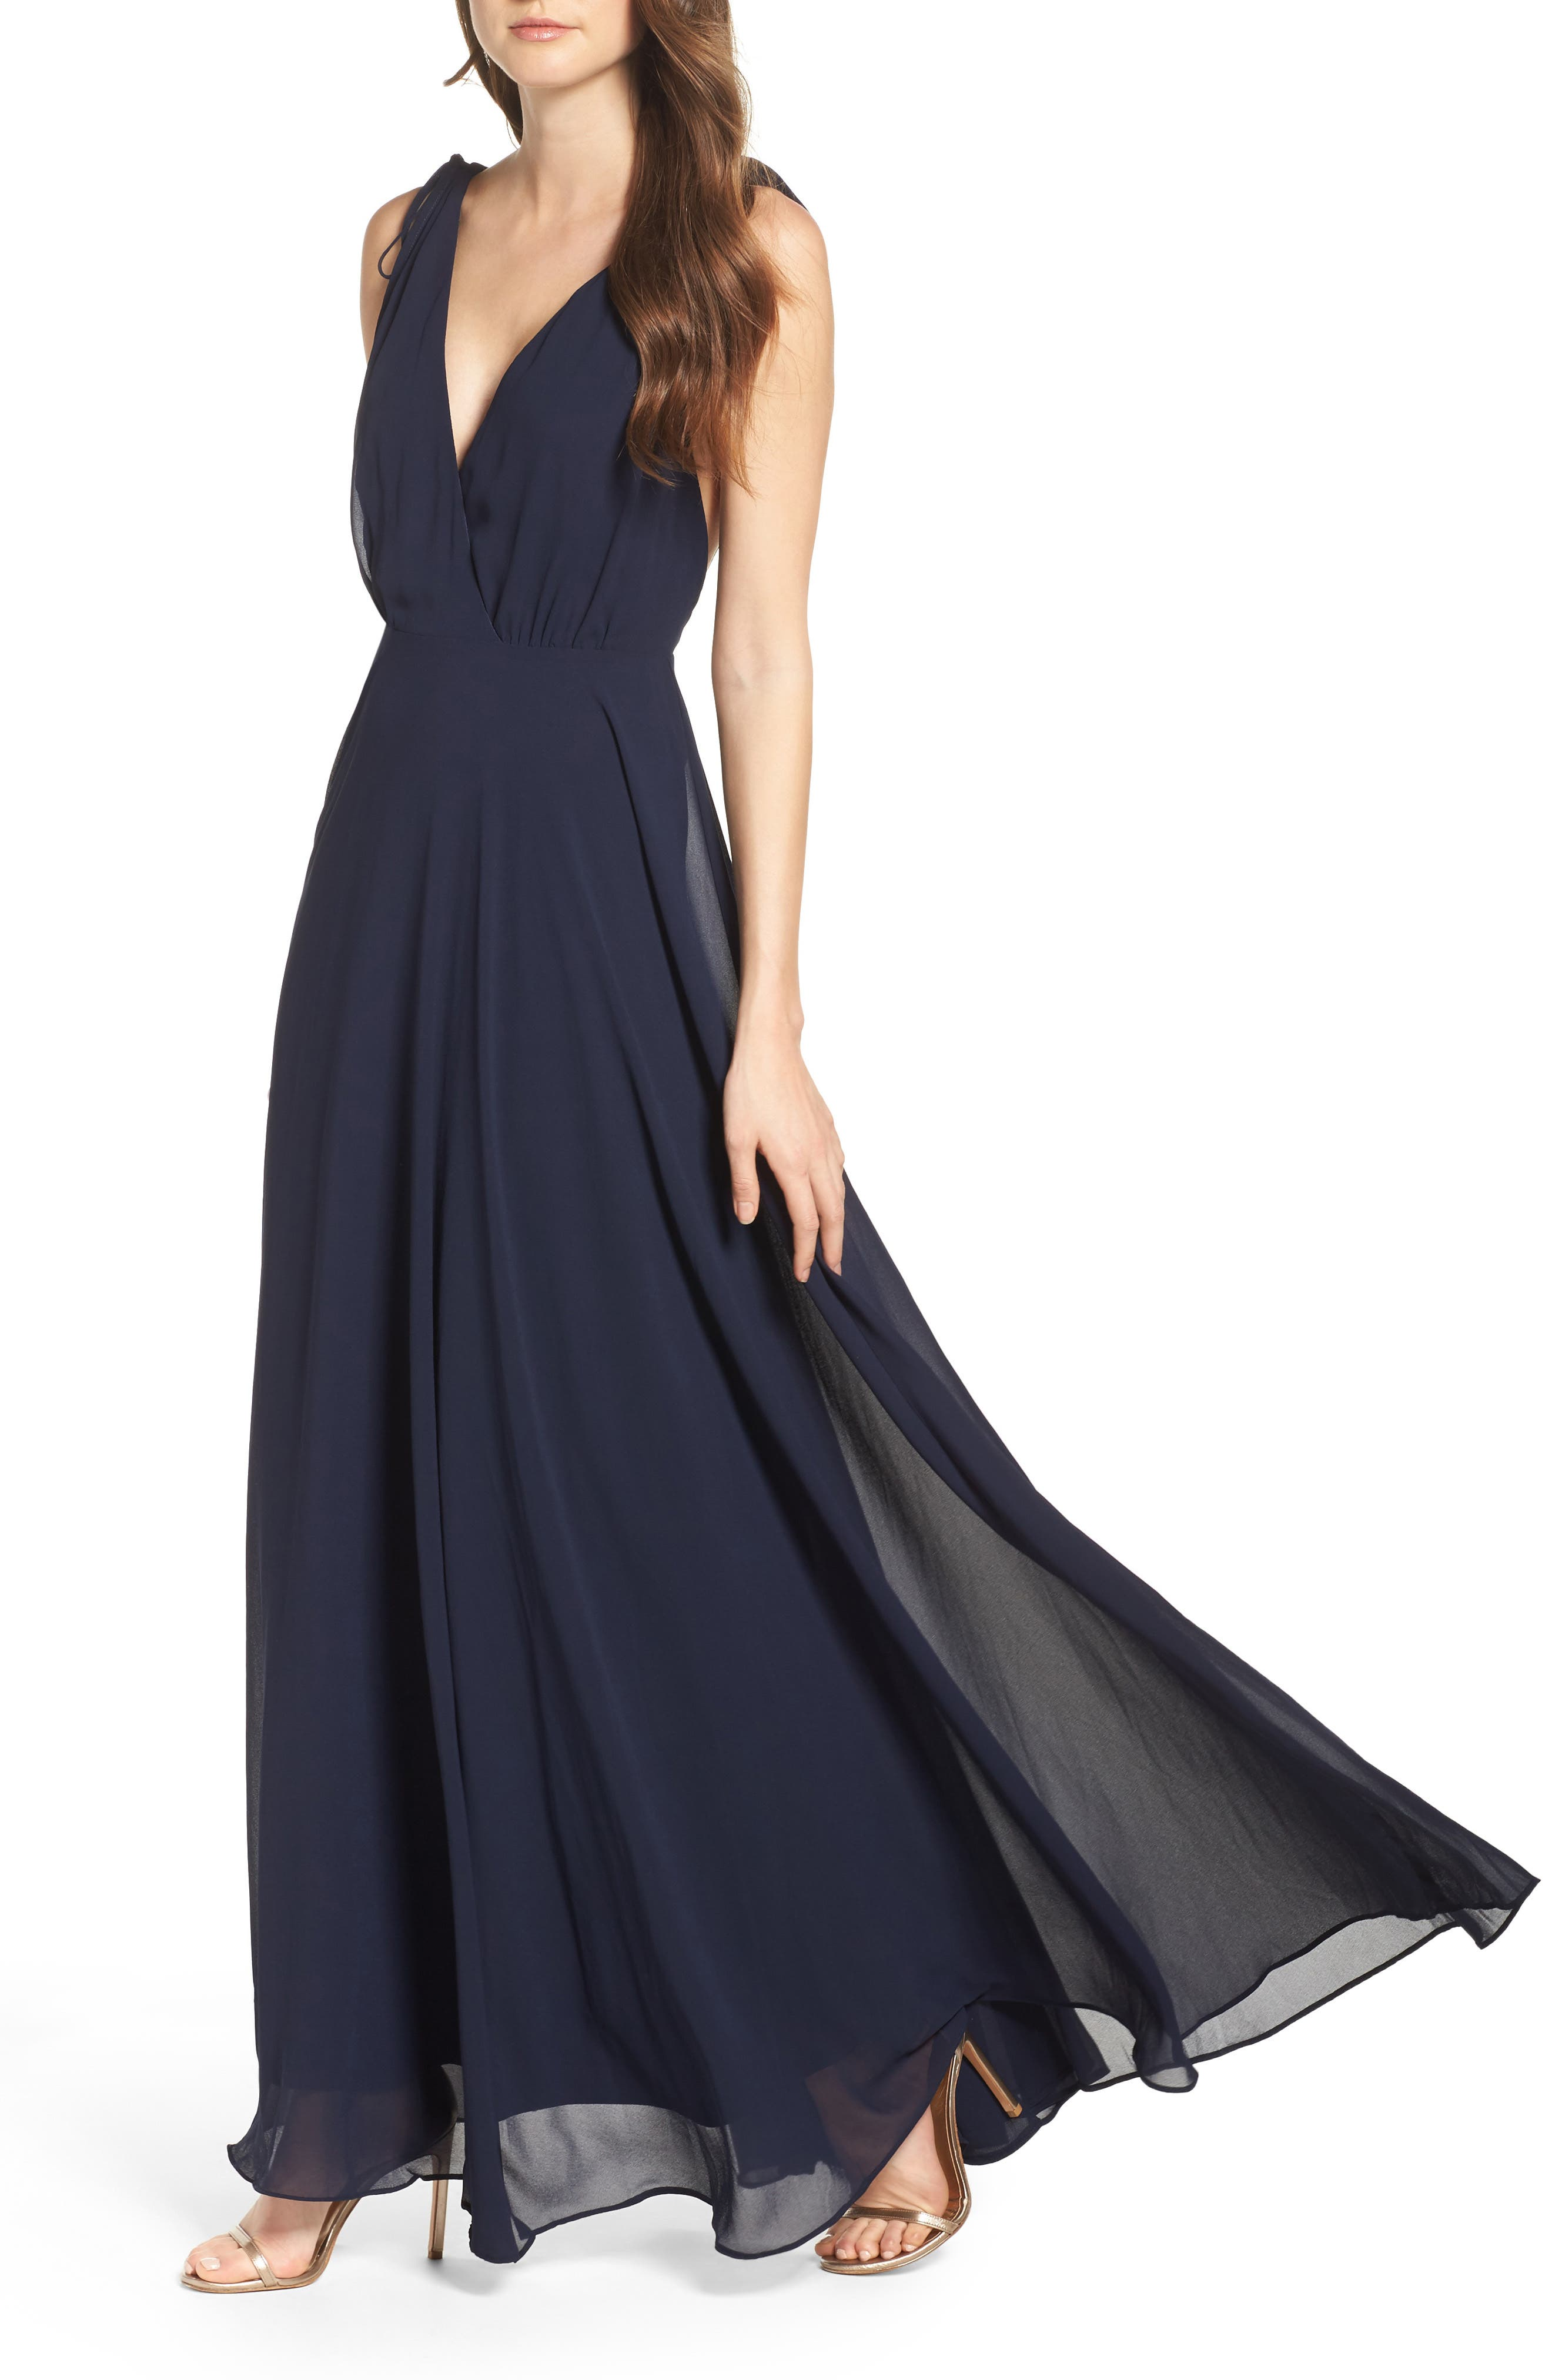 LULUS,                             V-Neck Chiffon Gown,                             Alternate thumbnail 4, color,                             410